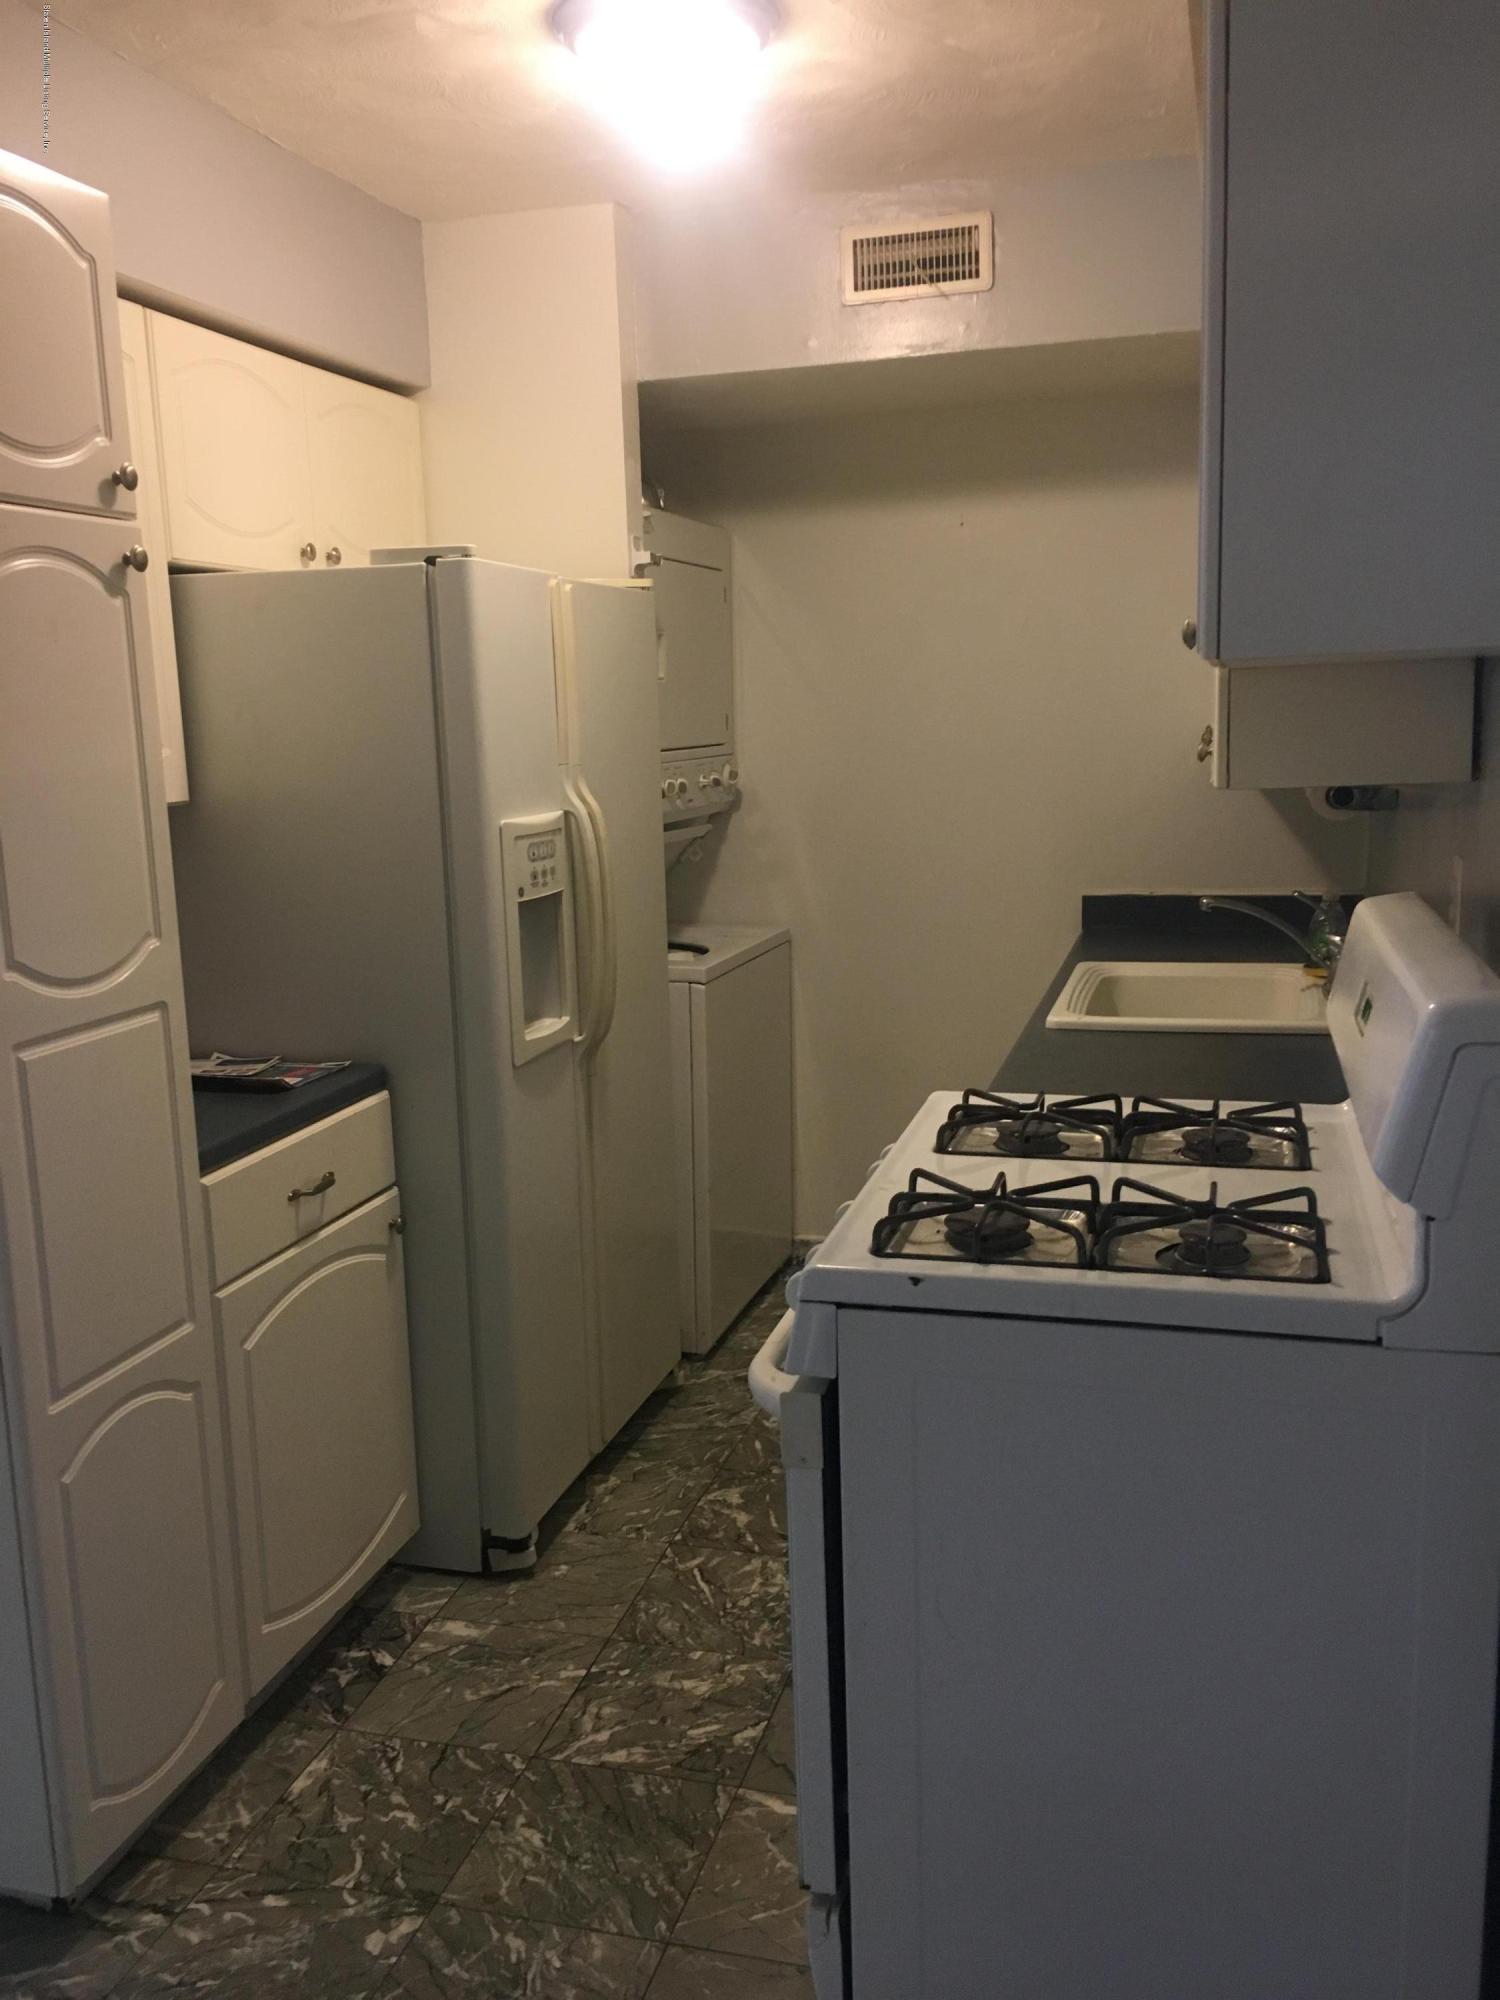 4189 Amboy Road,Staten Island,New York,10308,United States,2 Bedrooms Bedrooms,5 Rooms Rooms,2 BathroomsBathrooms,Res-Rental,Amboy,1132081